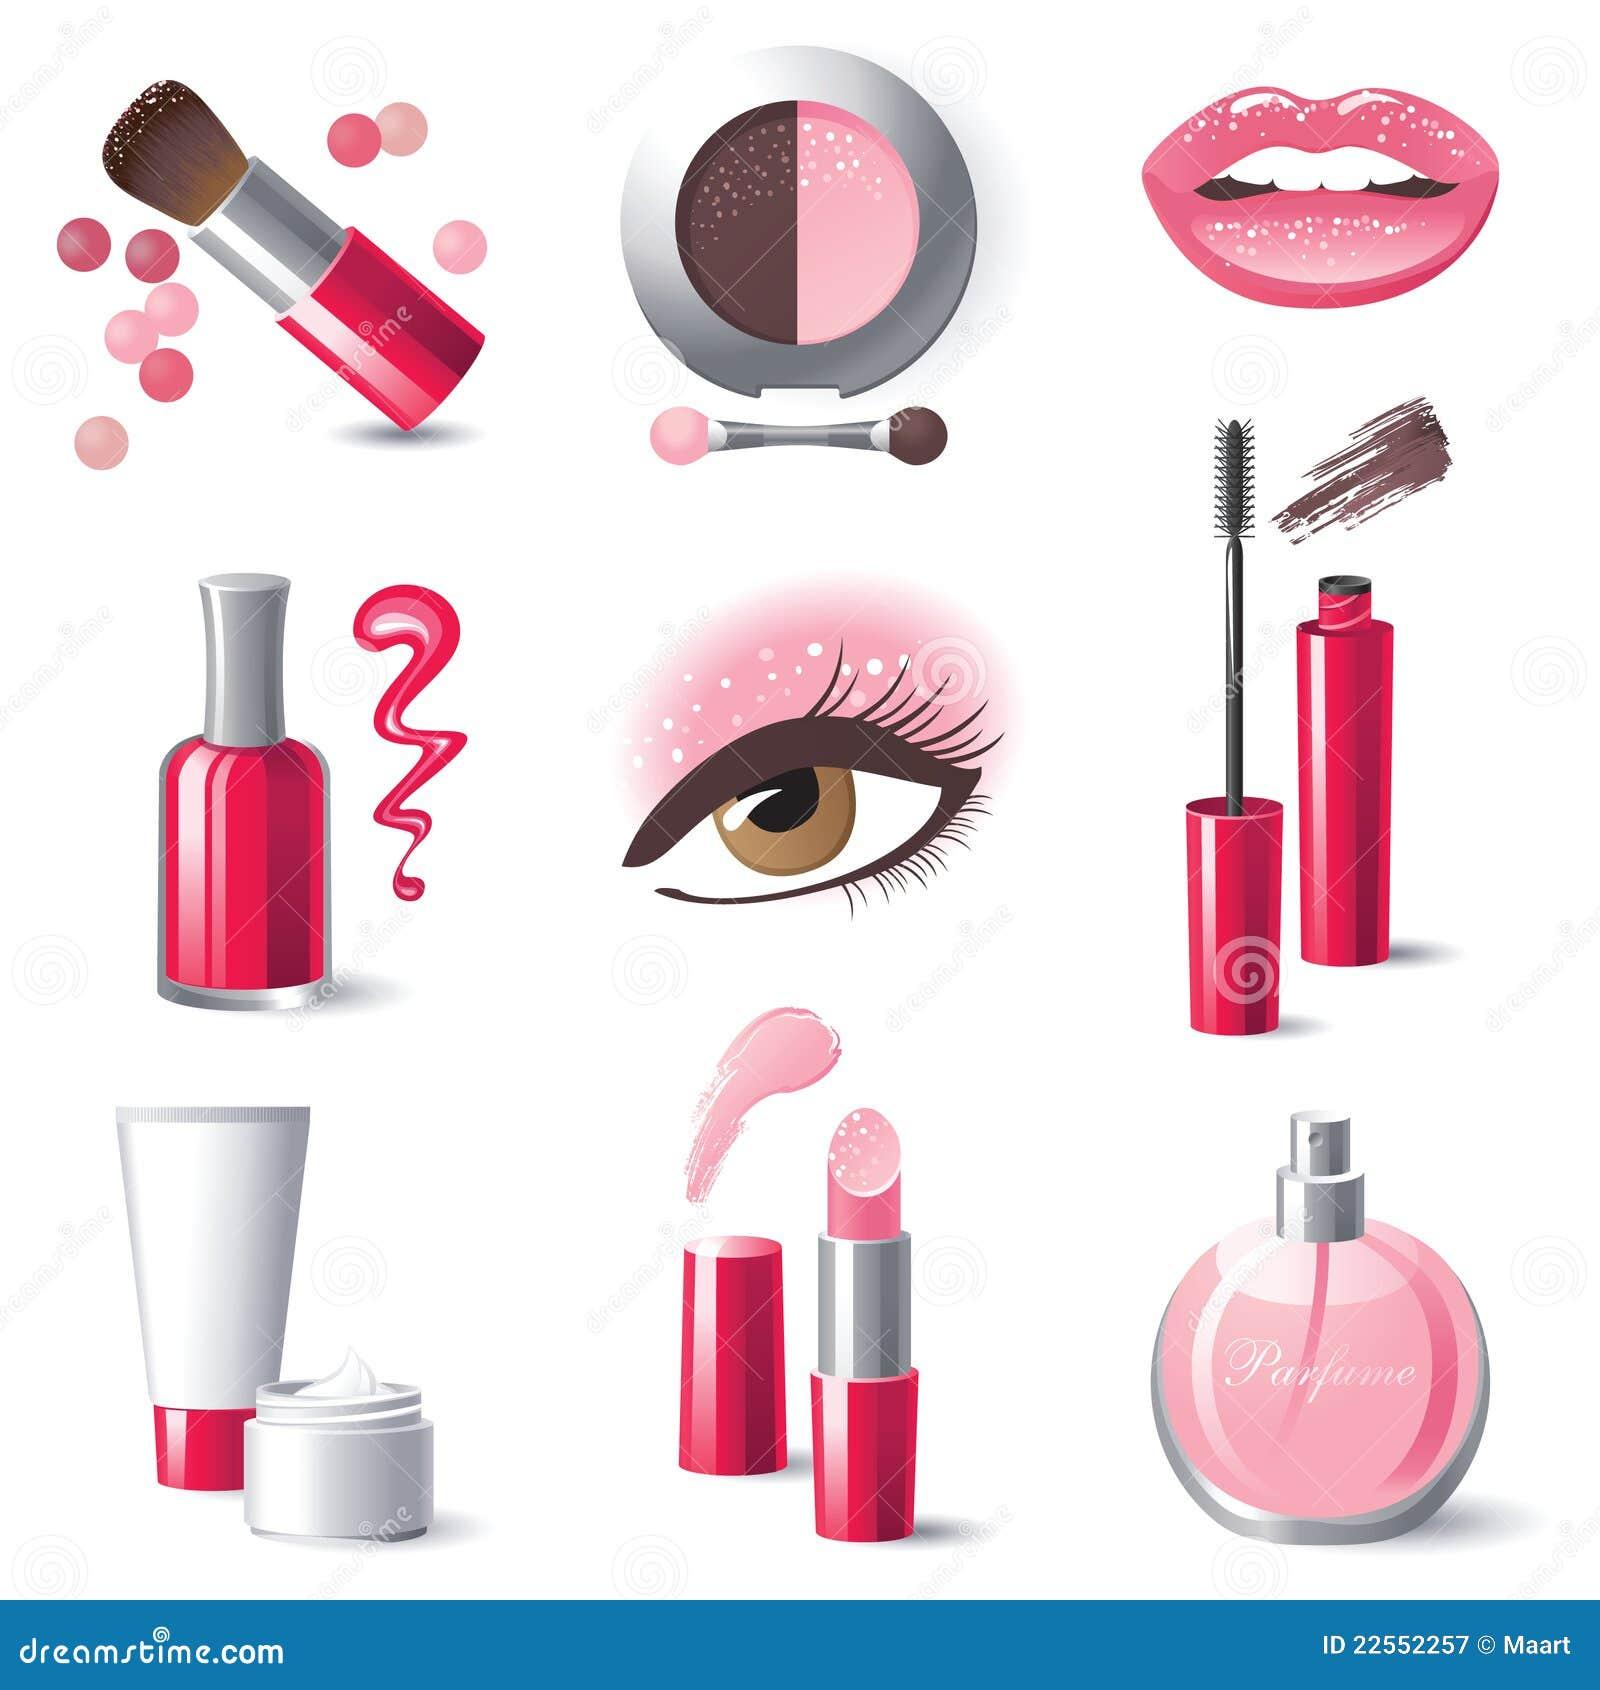 Make-up icons